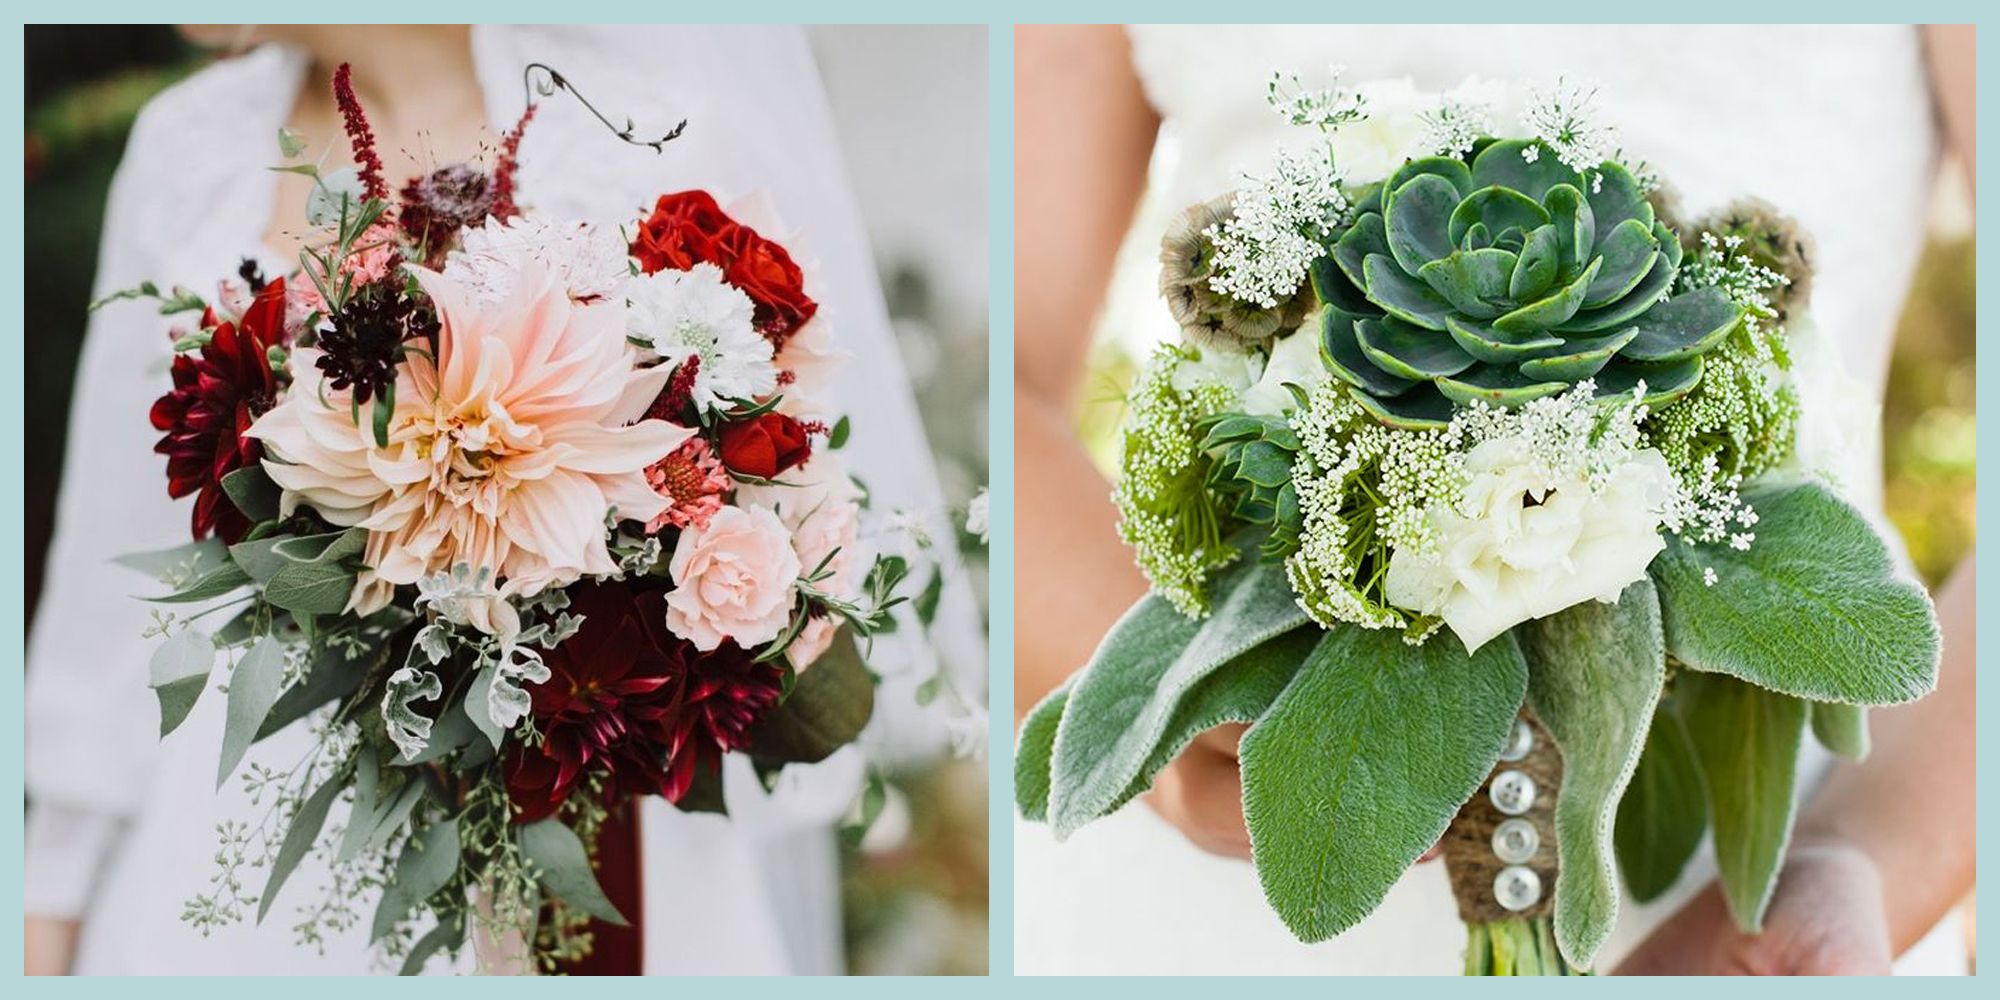 18 Gorgeous Winter Wedding Bouquet Ideas Flowers For Winter Weddings